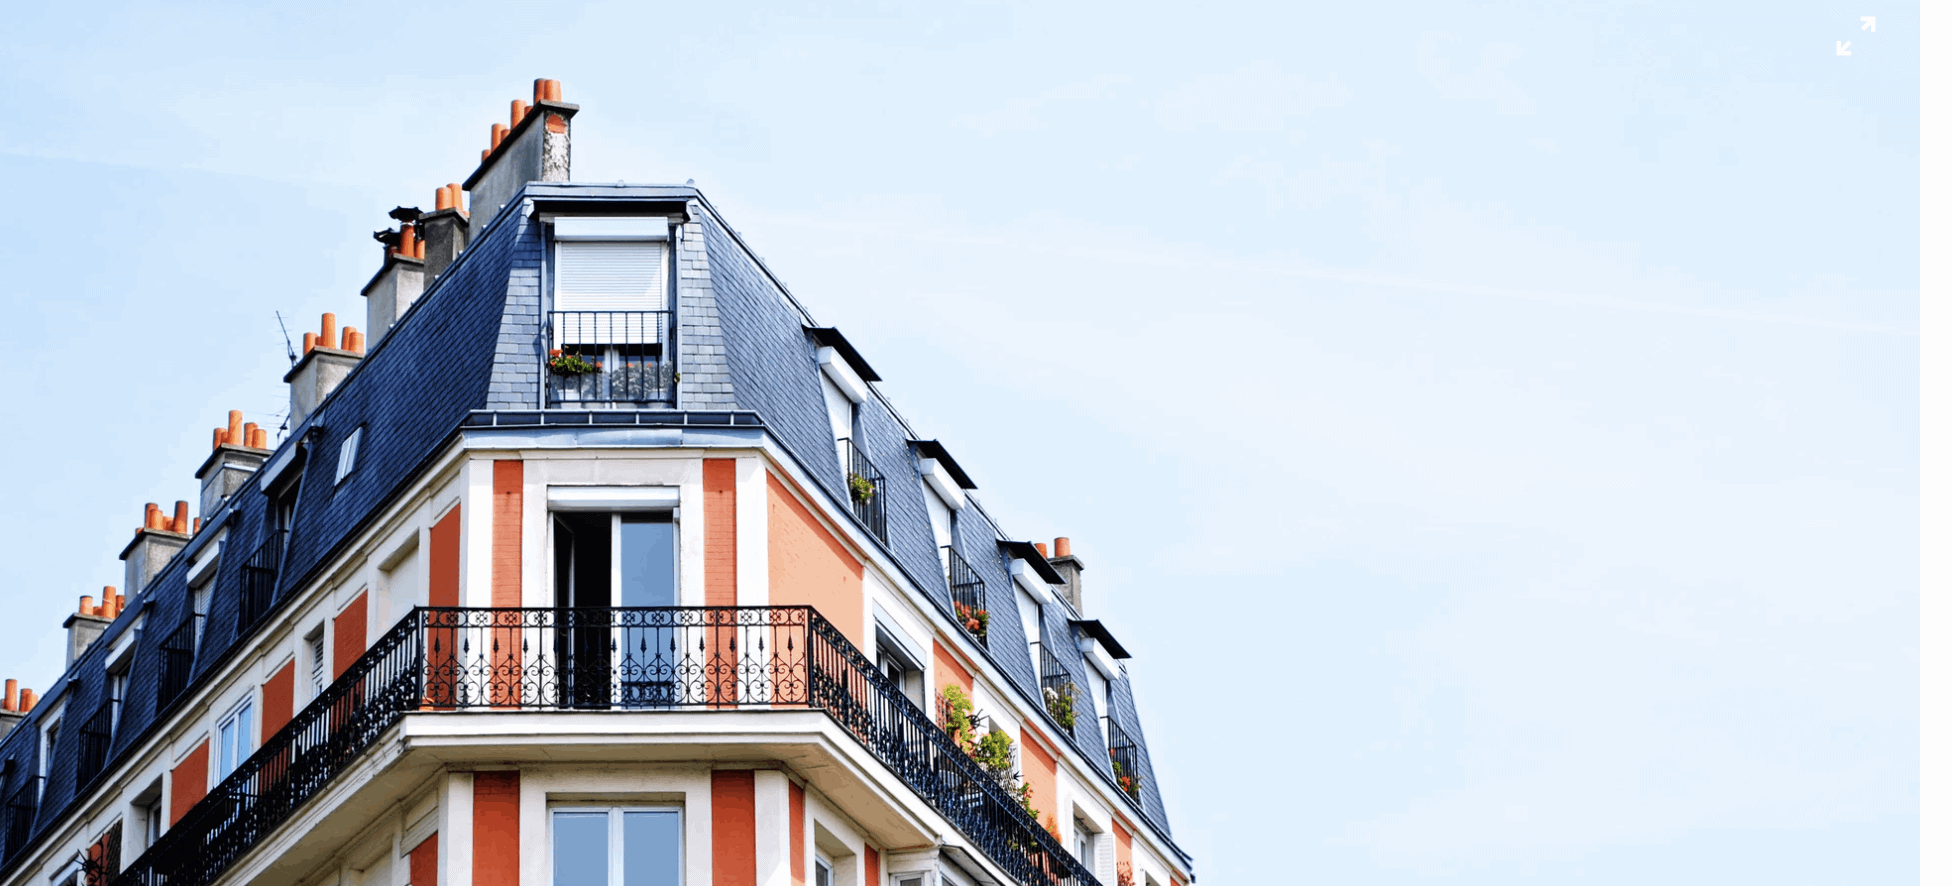 wohnportfolios mehrfamilienhäuser micro-living